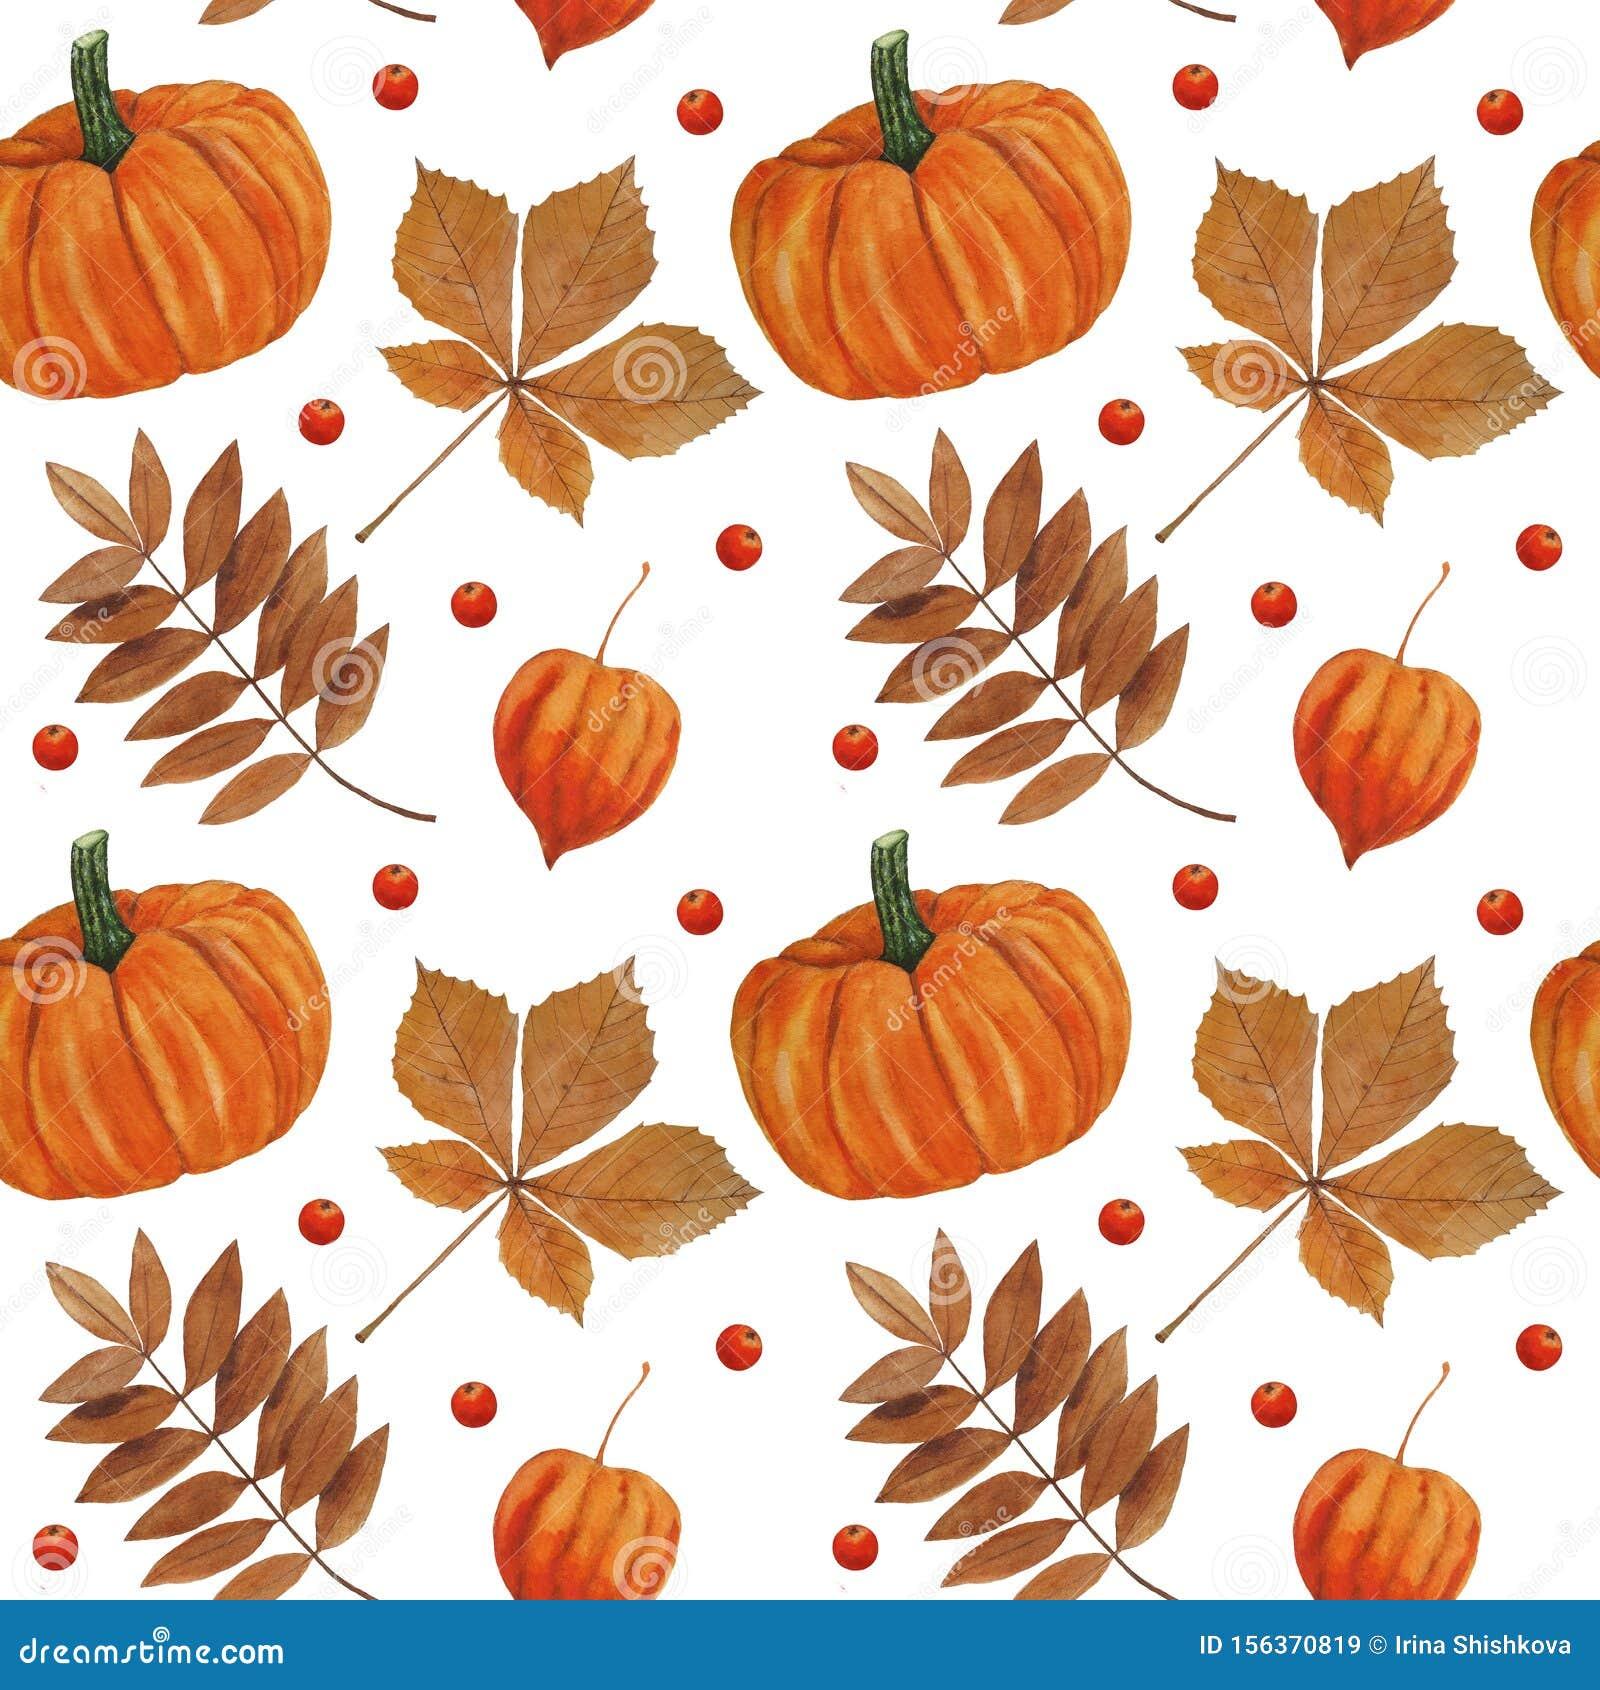 Pattern Autumn Leaves And Pumpkin Illustrations Watercolor Botanical Digital Paper Textile Autumn Autumn Decor Wallpaper Scrapbook Stock Illustration Illustration Of Brown Fall 156370819